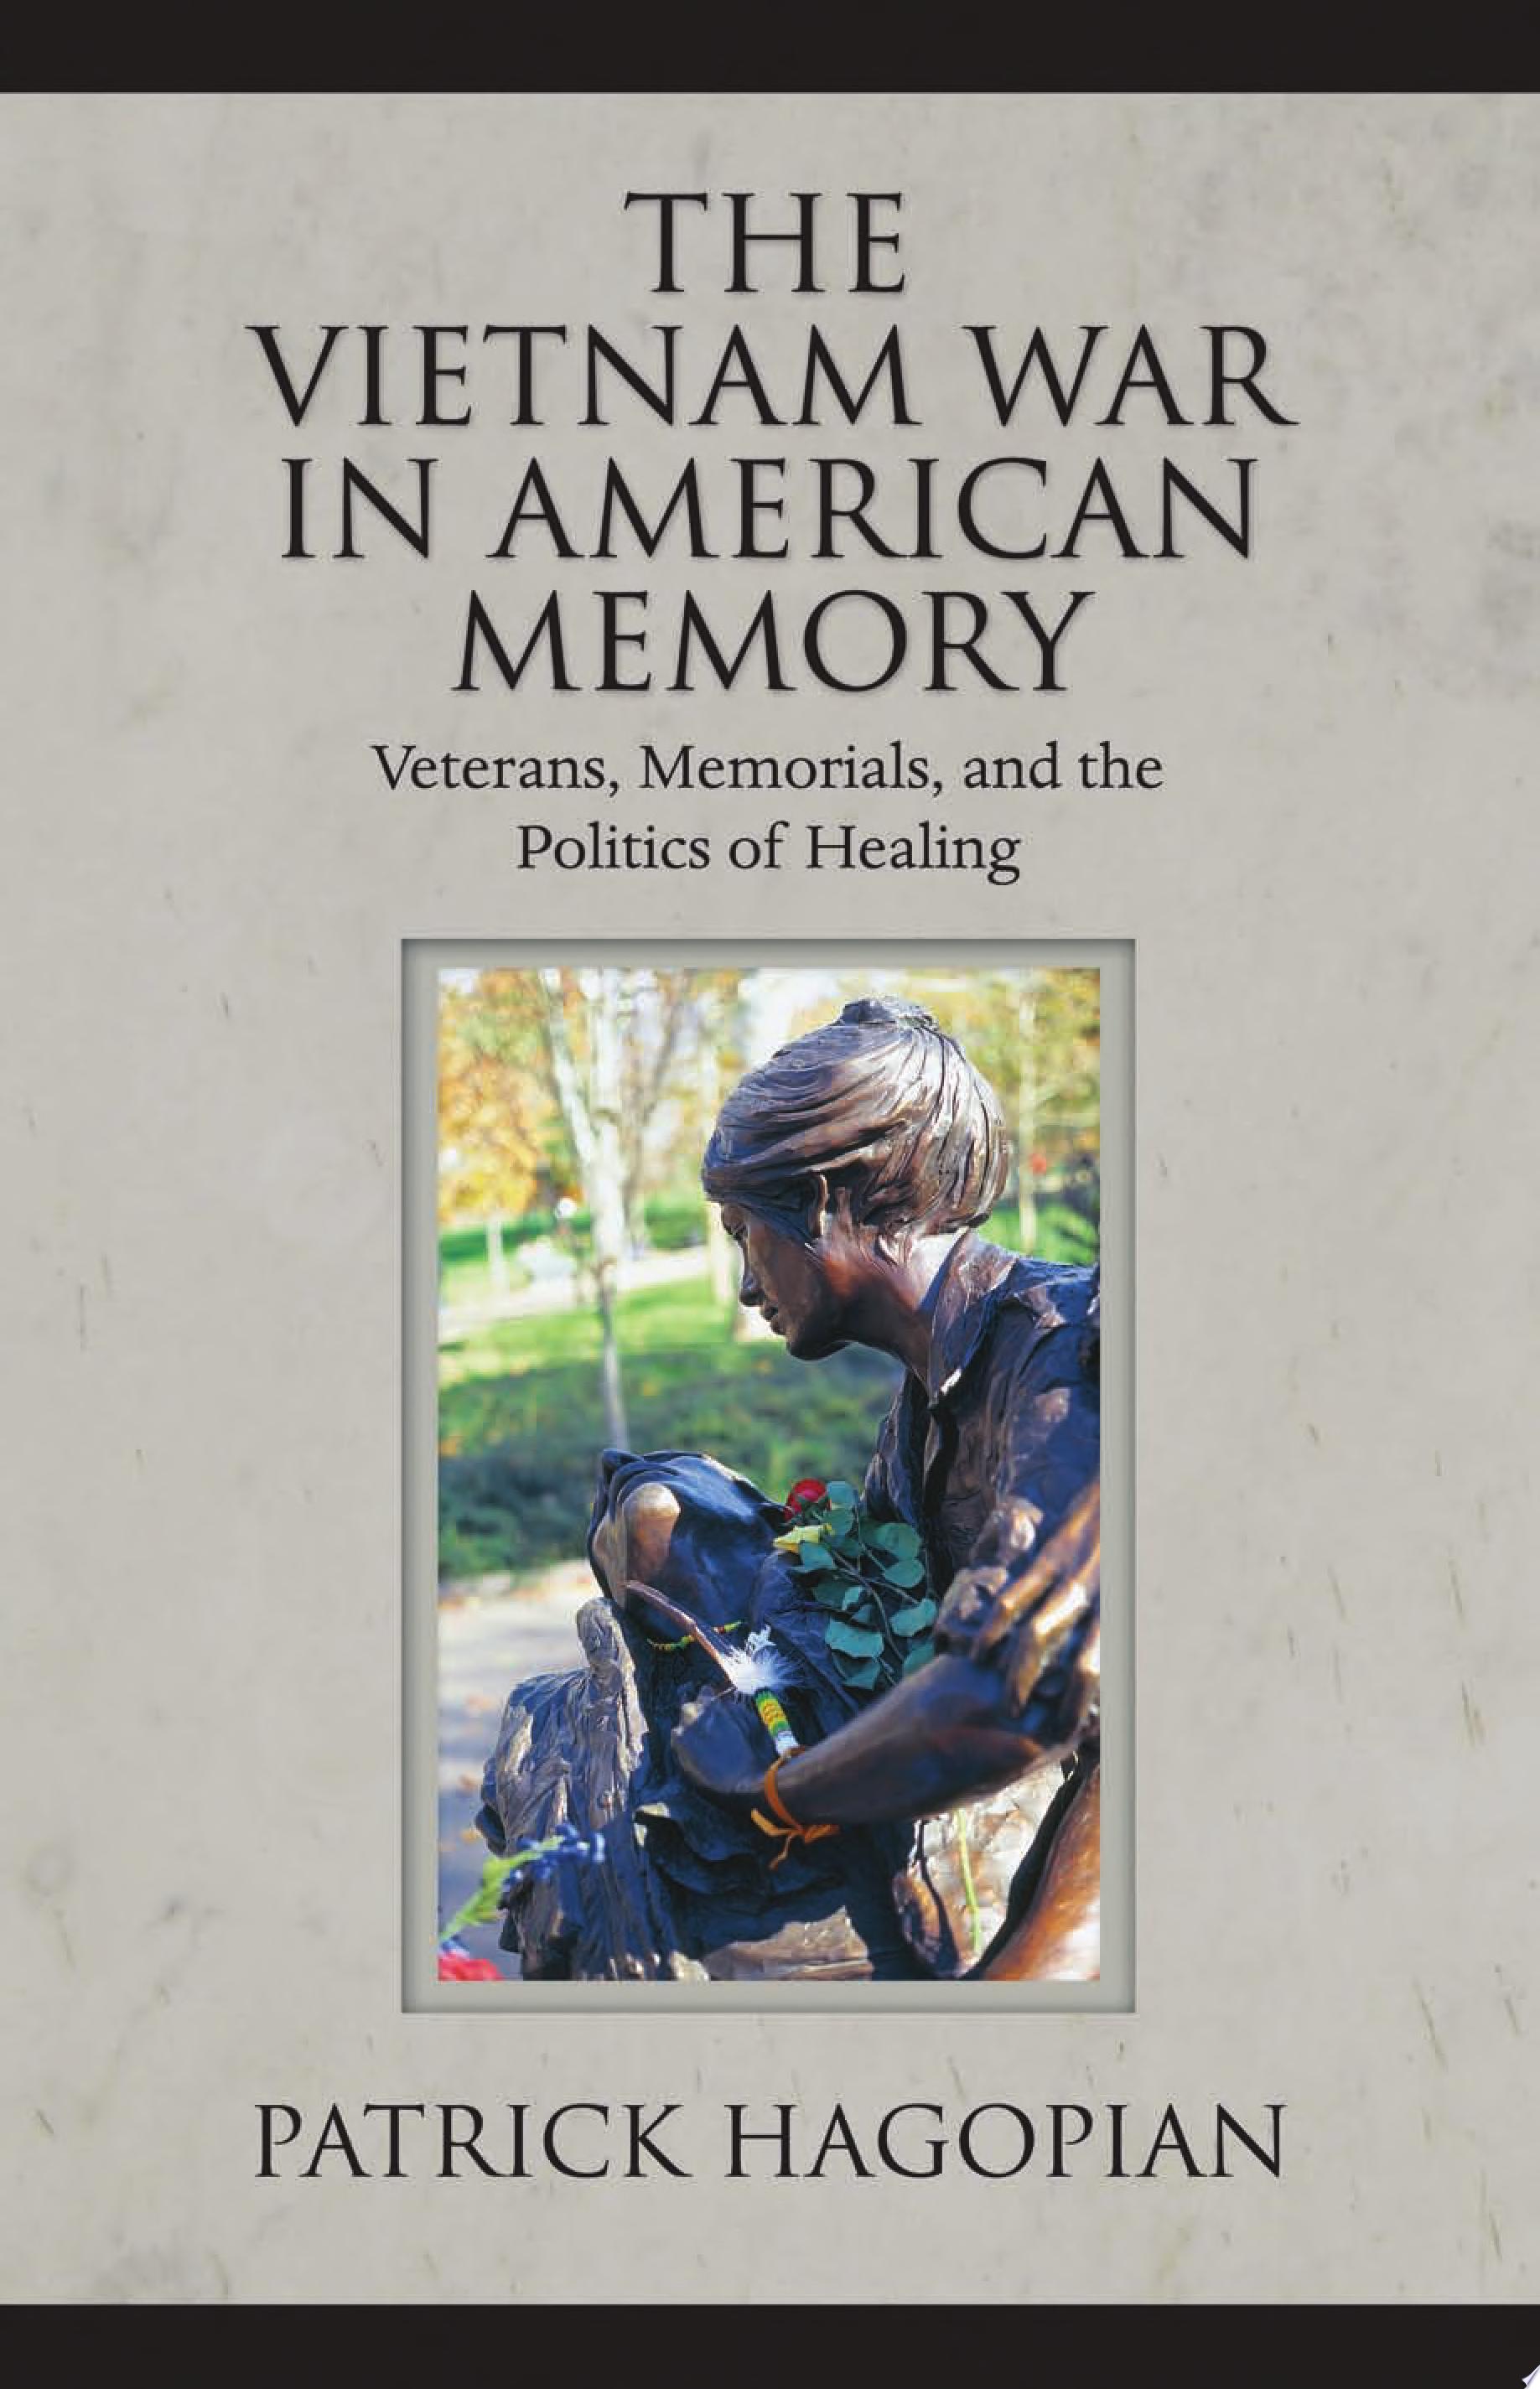 The Vietnam War in American Memory